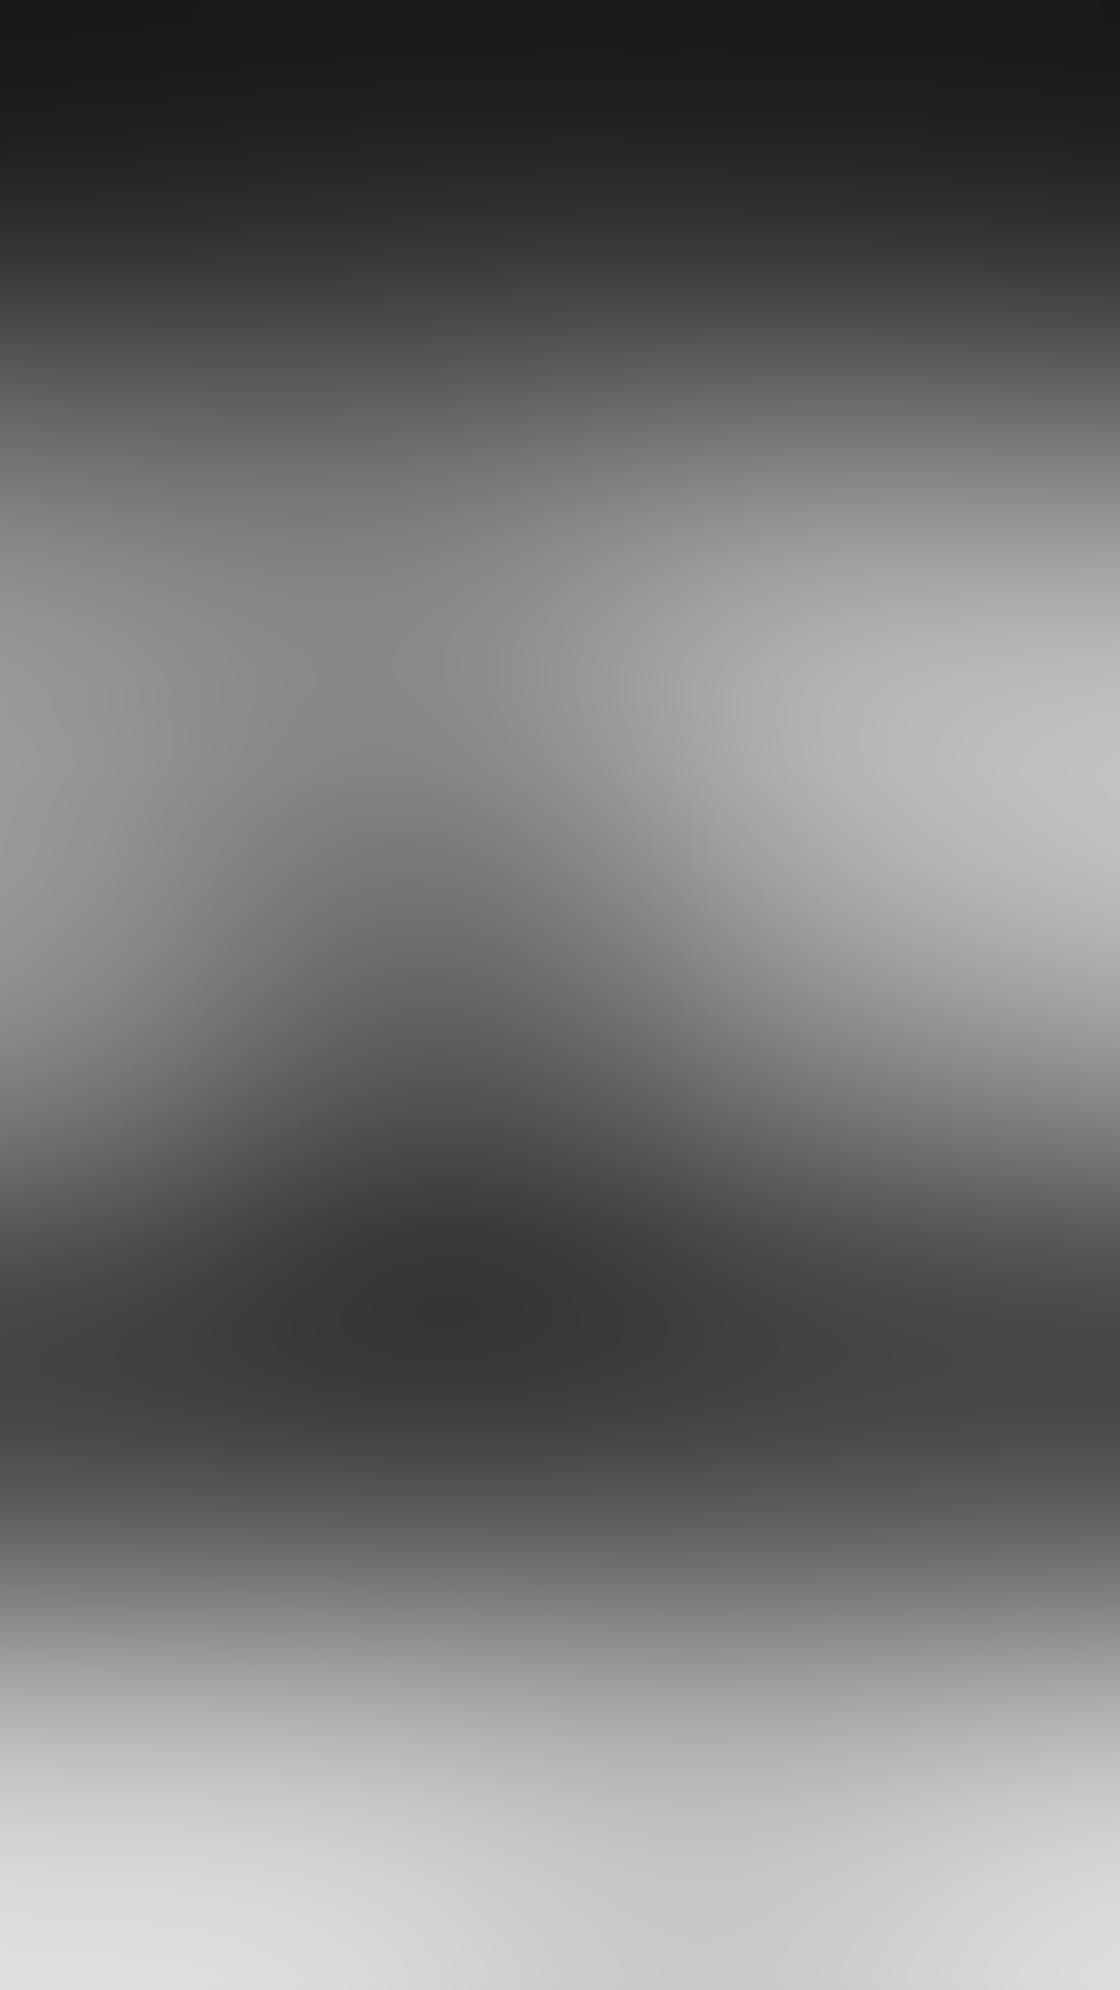 Lens Distortions iPhone App 3